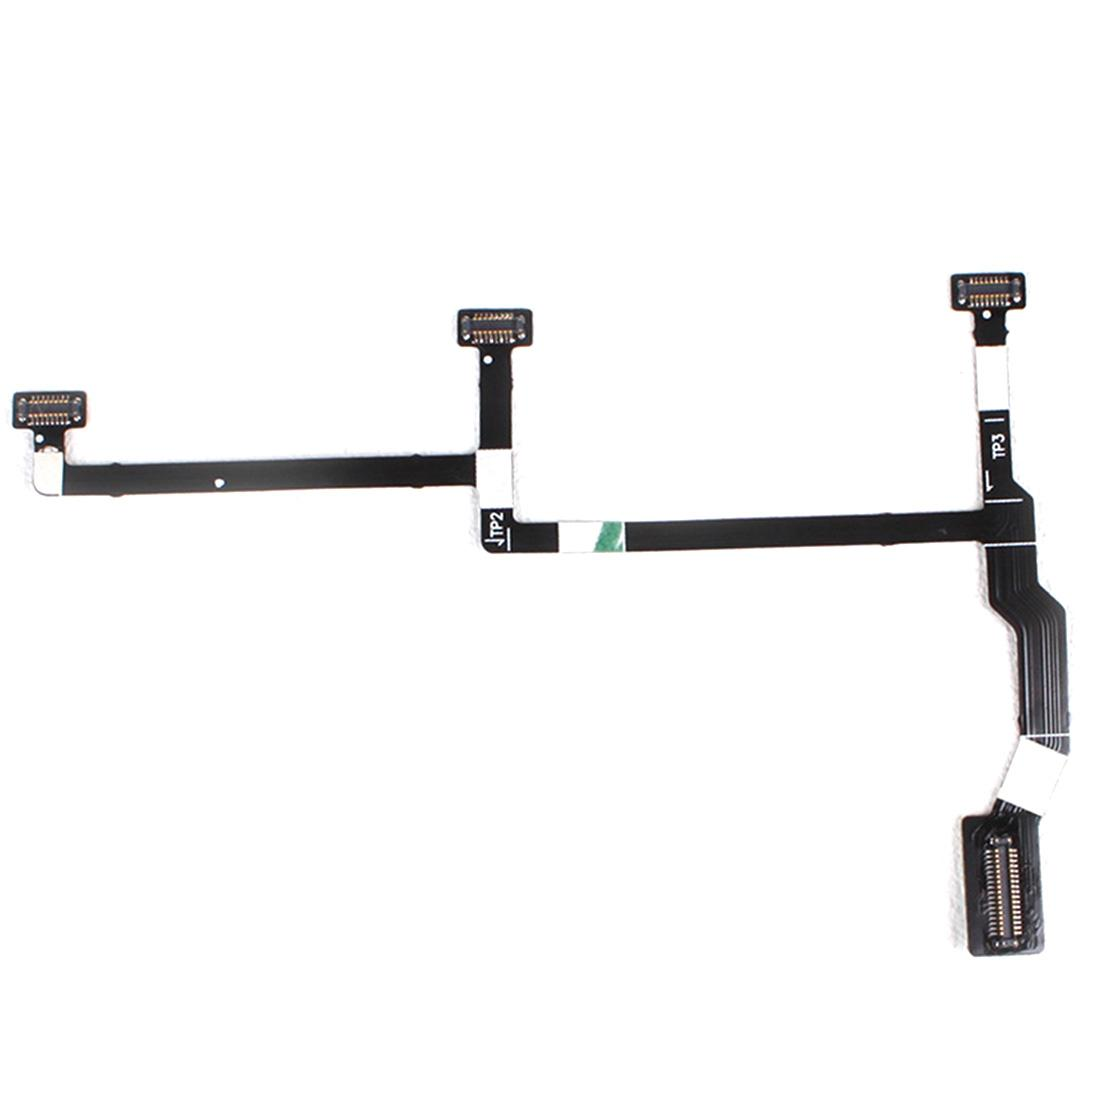 Maintenance Accessories Flexible Flat Cable Ribbon Cable Parts For DJI  Mavic Pro Gimbal Camera